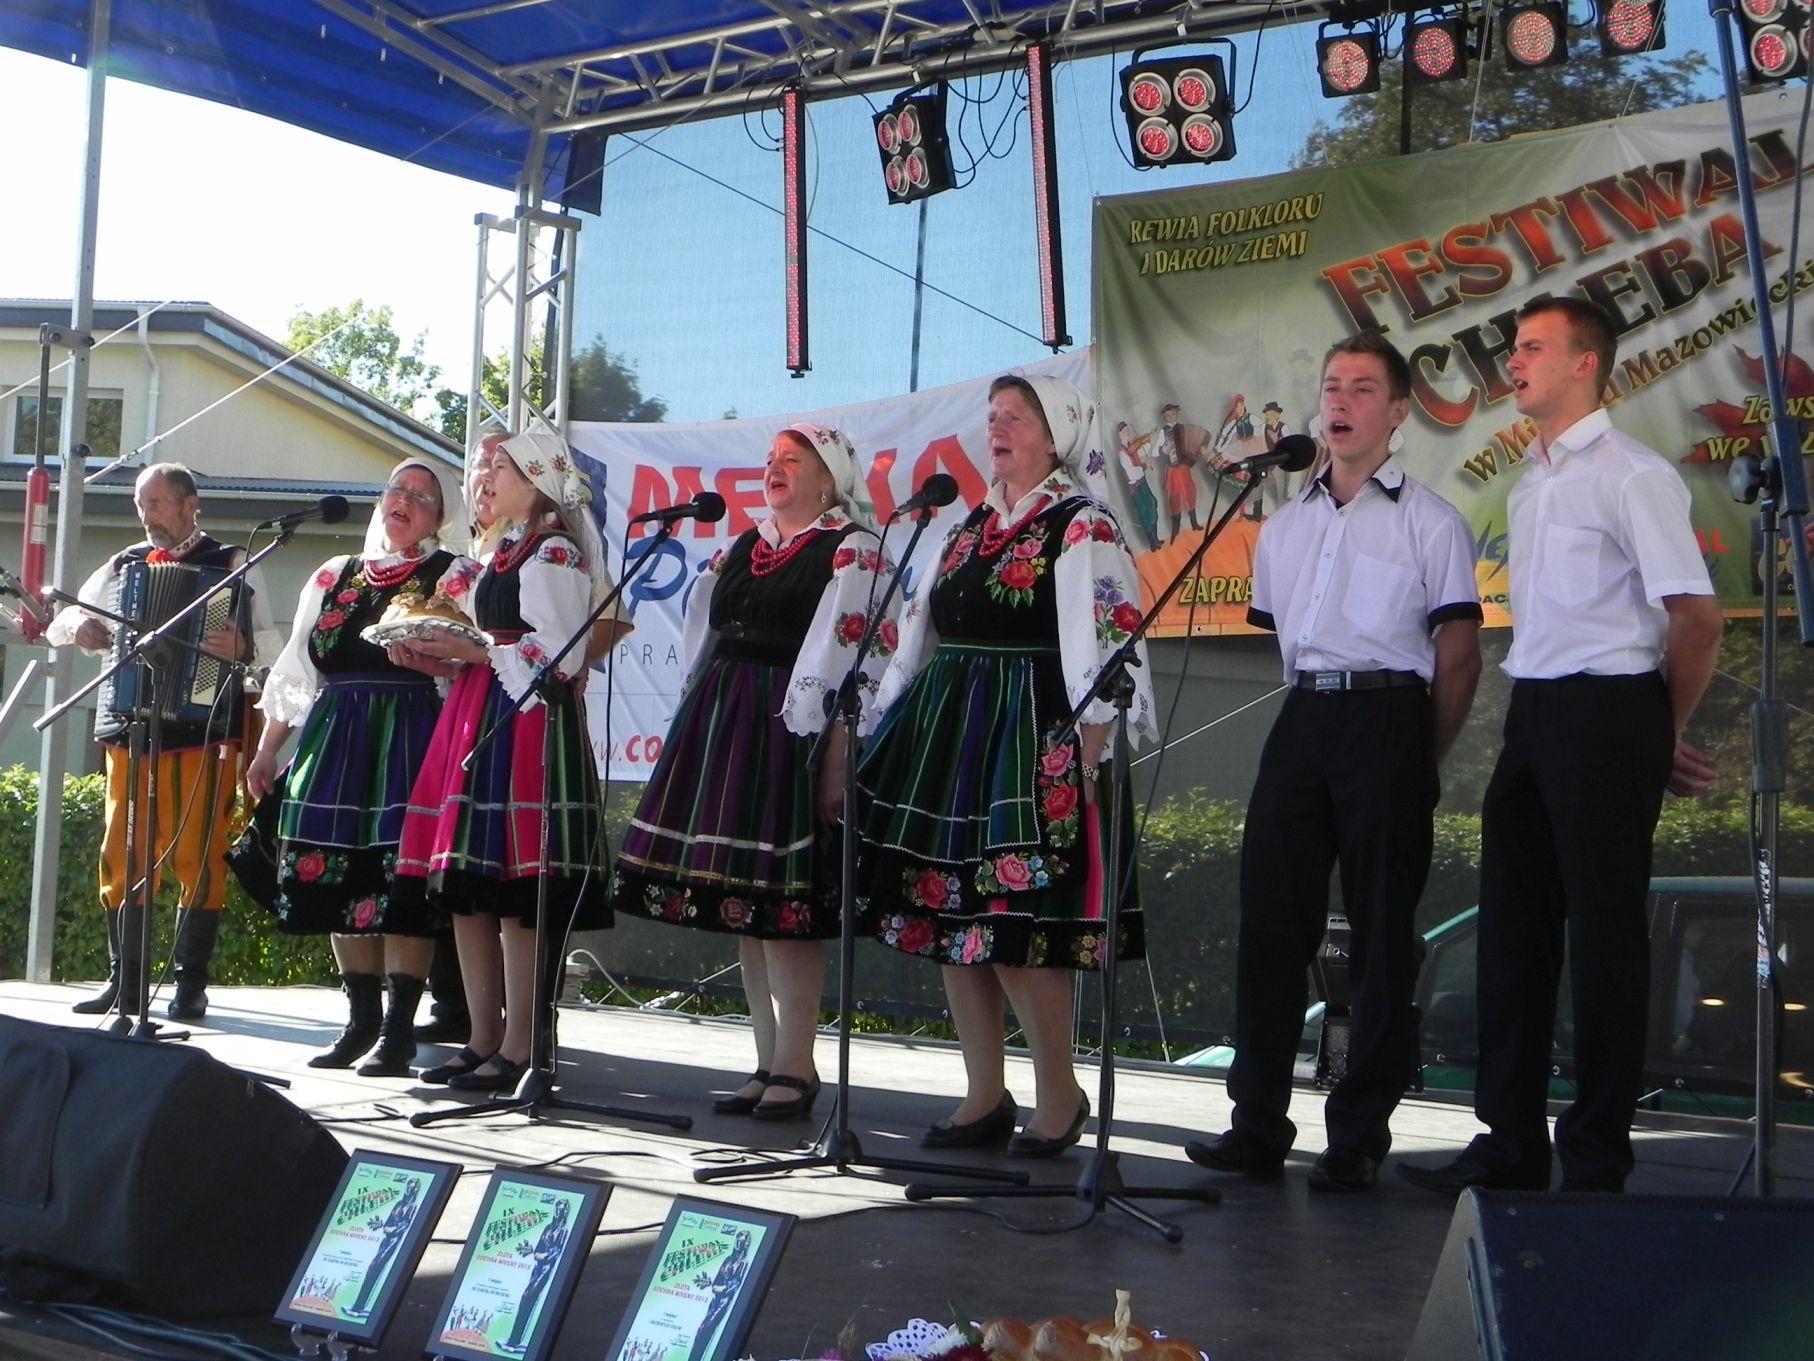 2013-09-10 Festyn - Mińsk Maz (66)